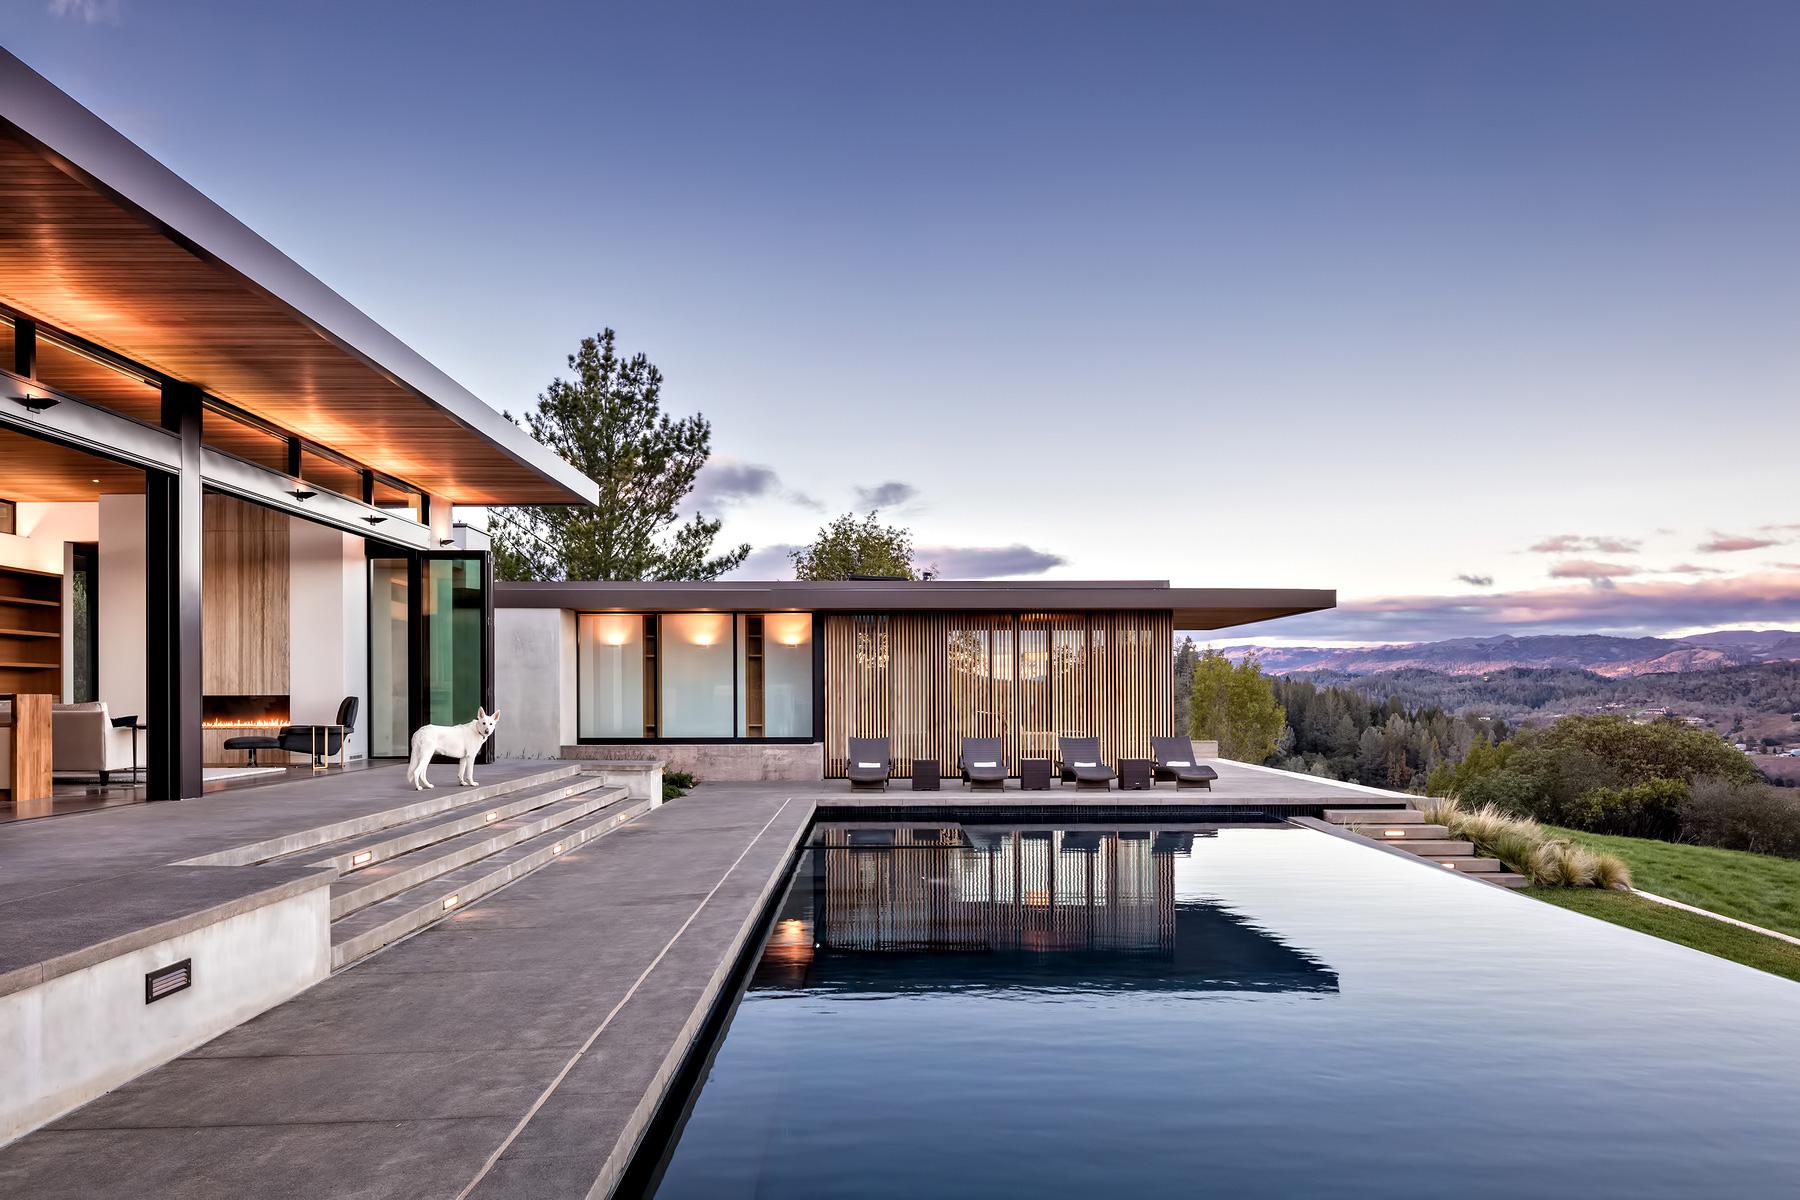 Sonoma Luxury Residence – W Dry Creek Rd, Healdsburg, CA, USA